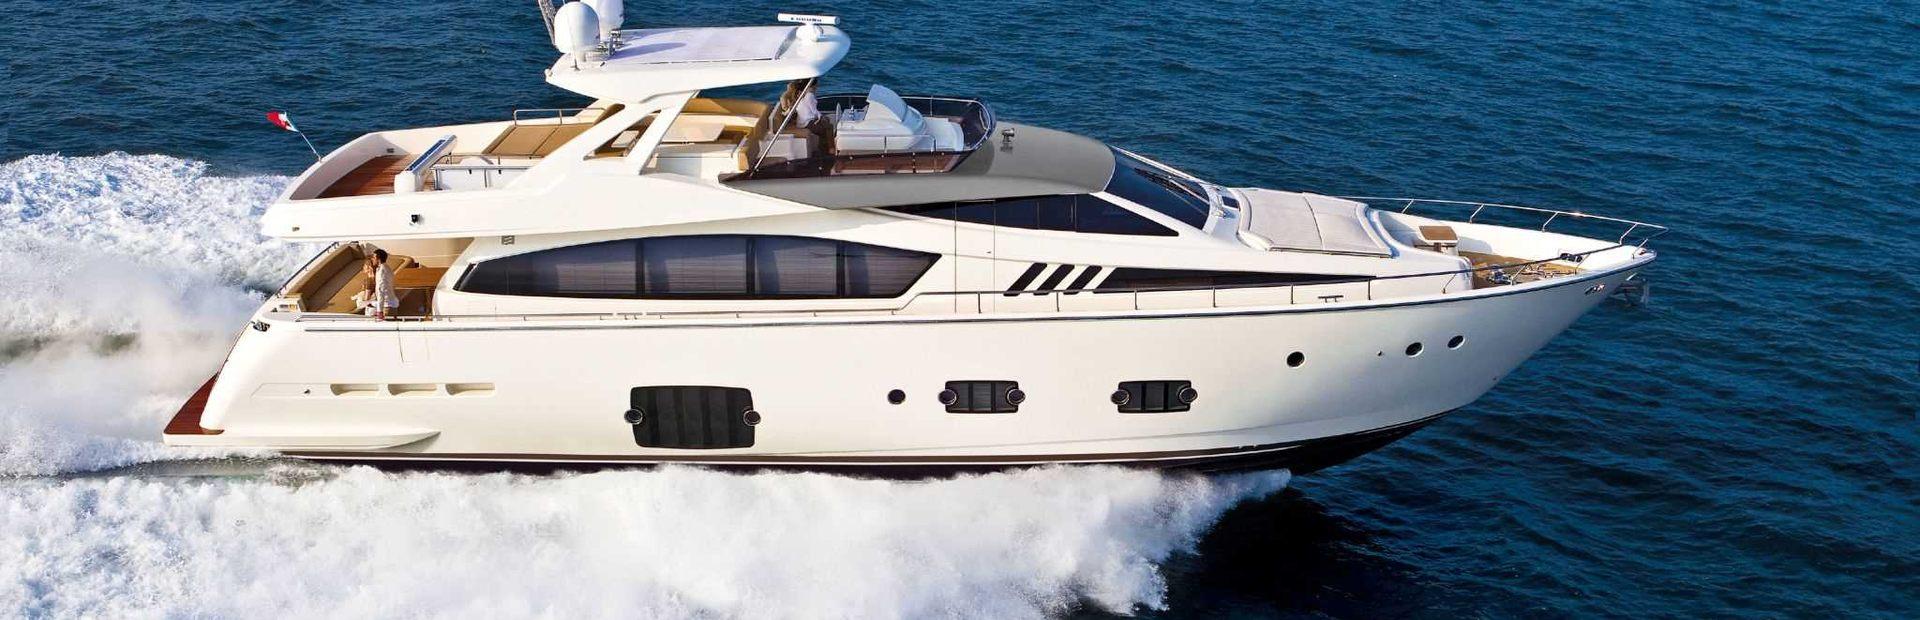 Ferretti Yachts 800 Yacht Charter